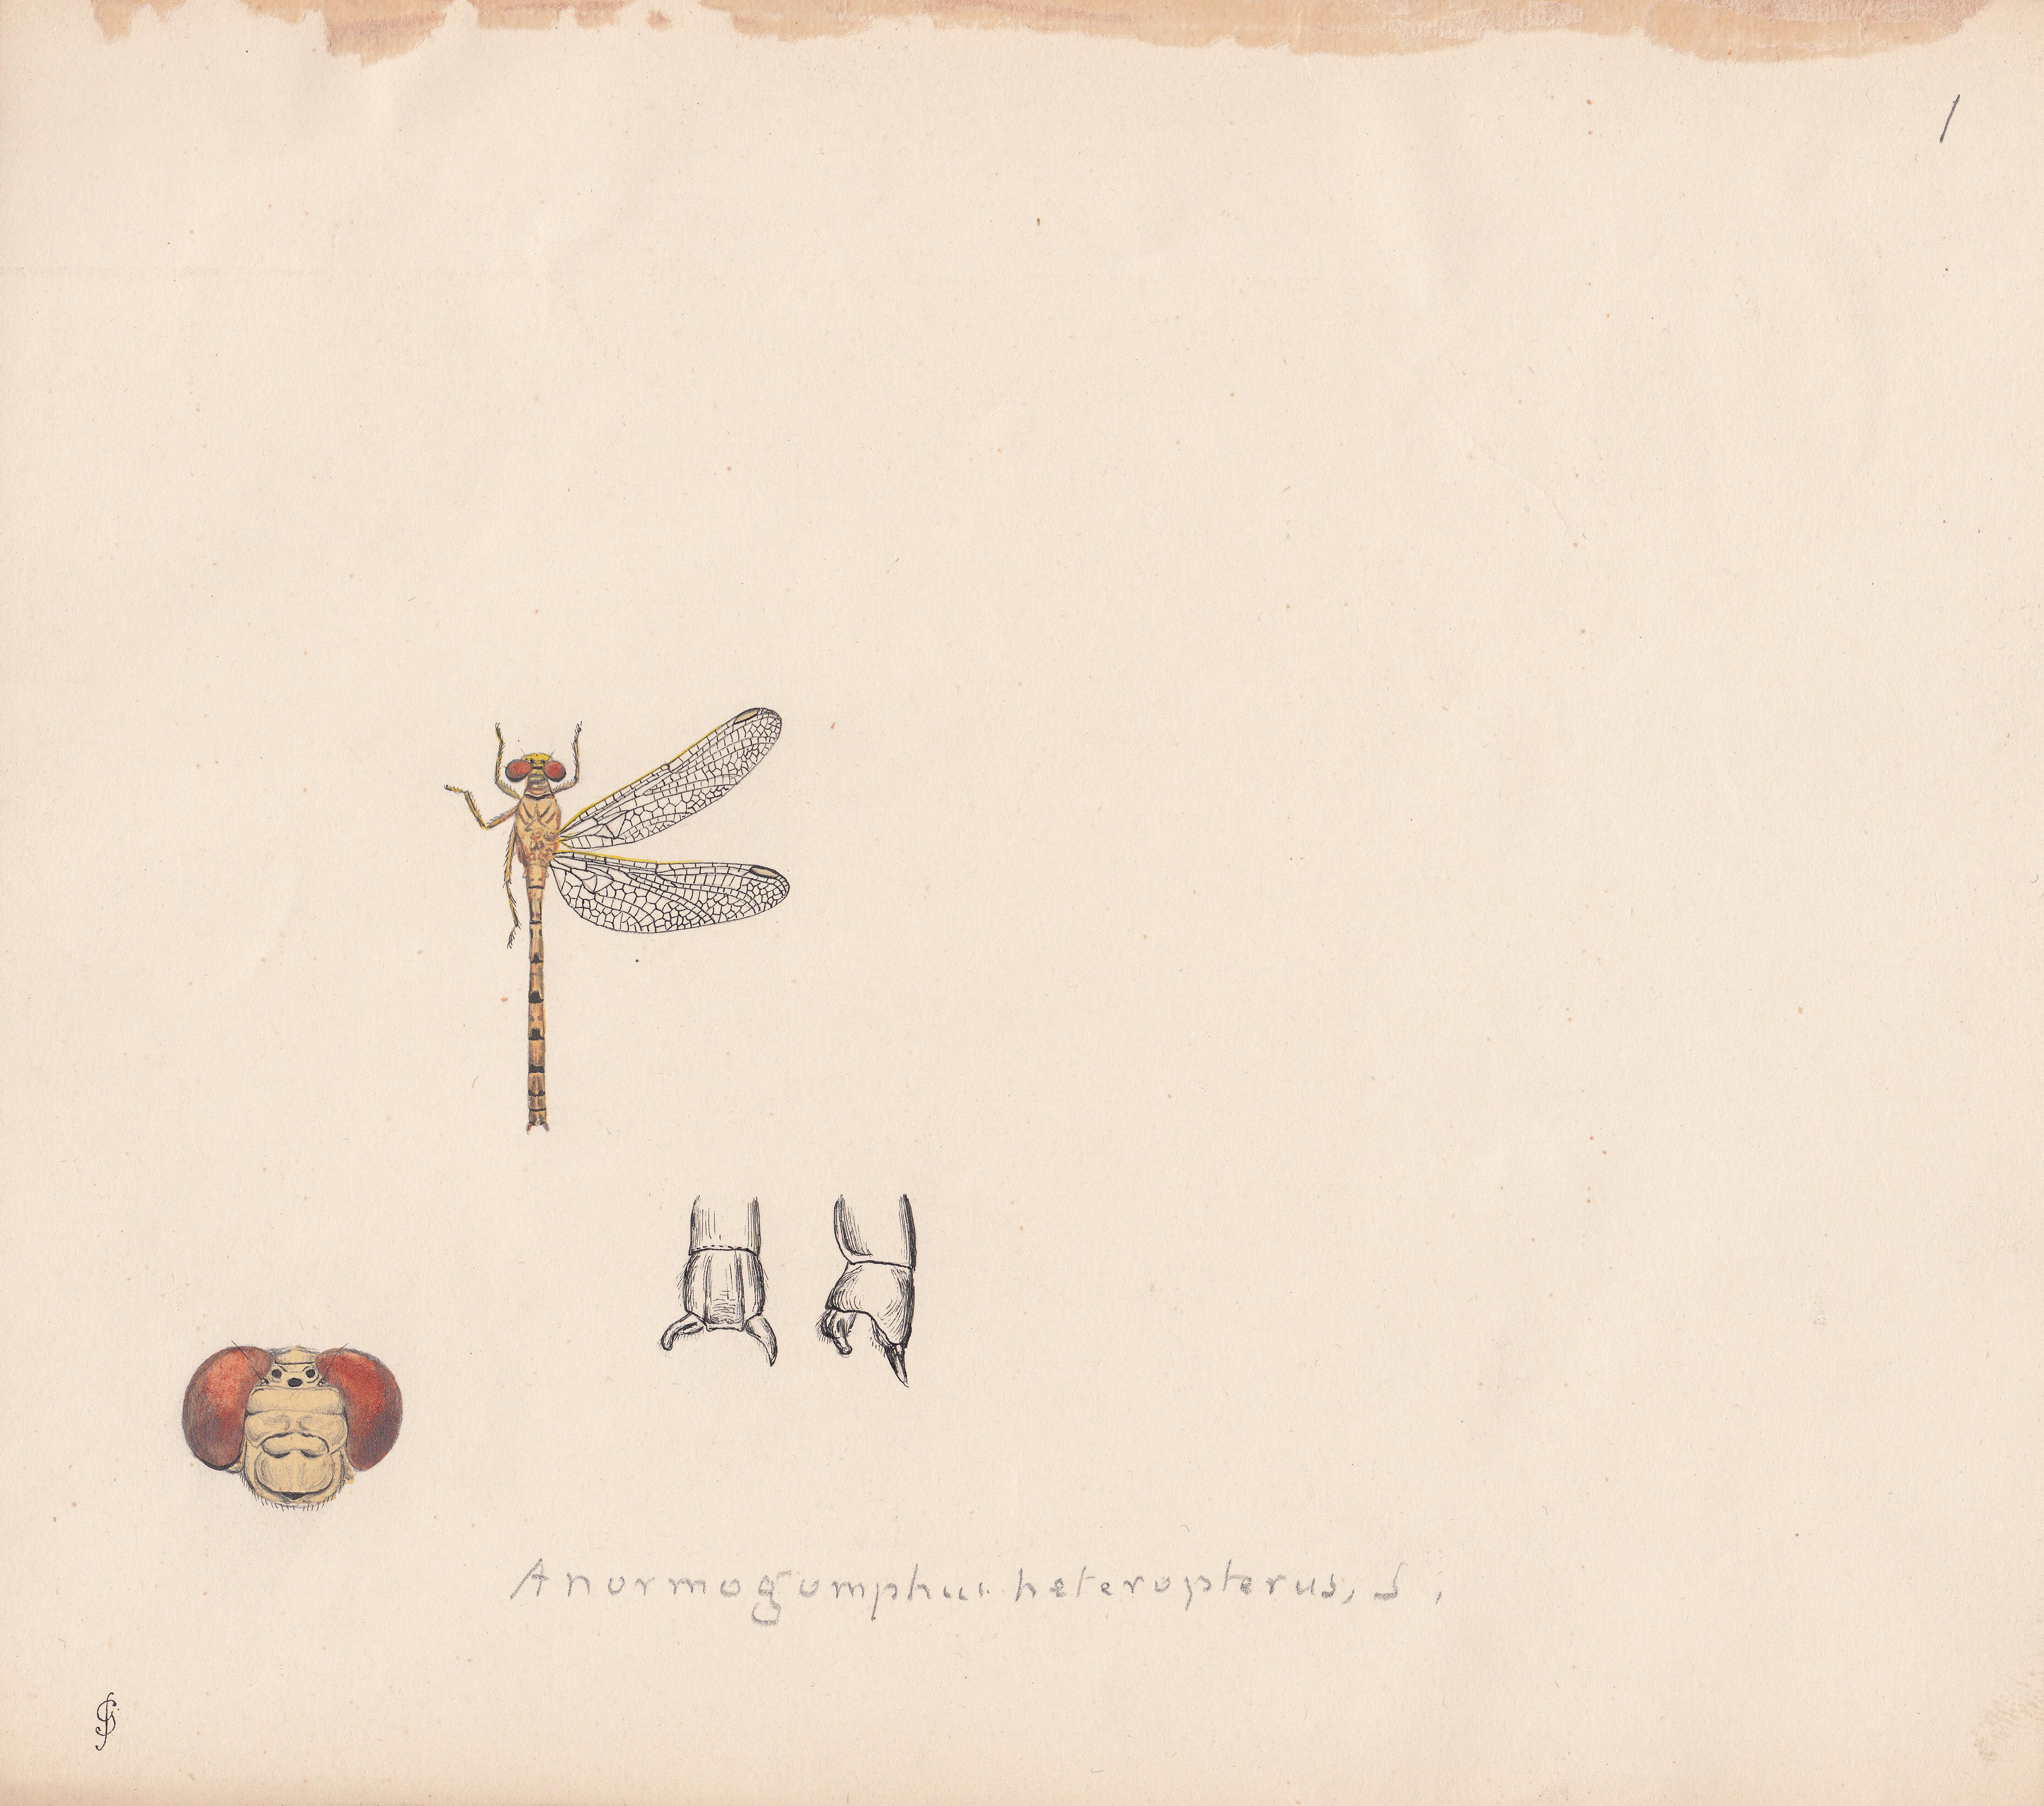 Anormogomphus heteropterus.jpg